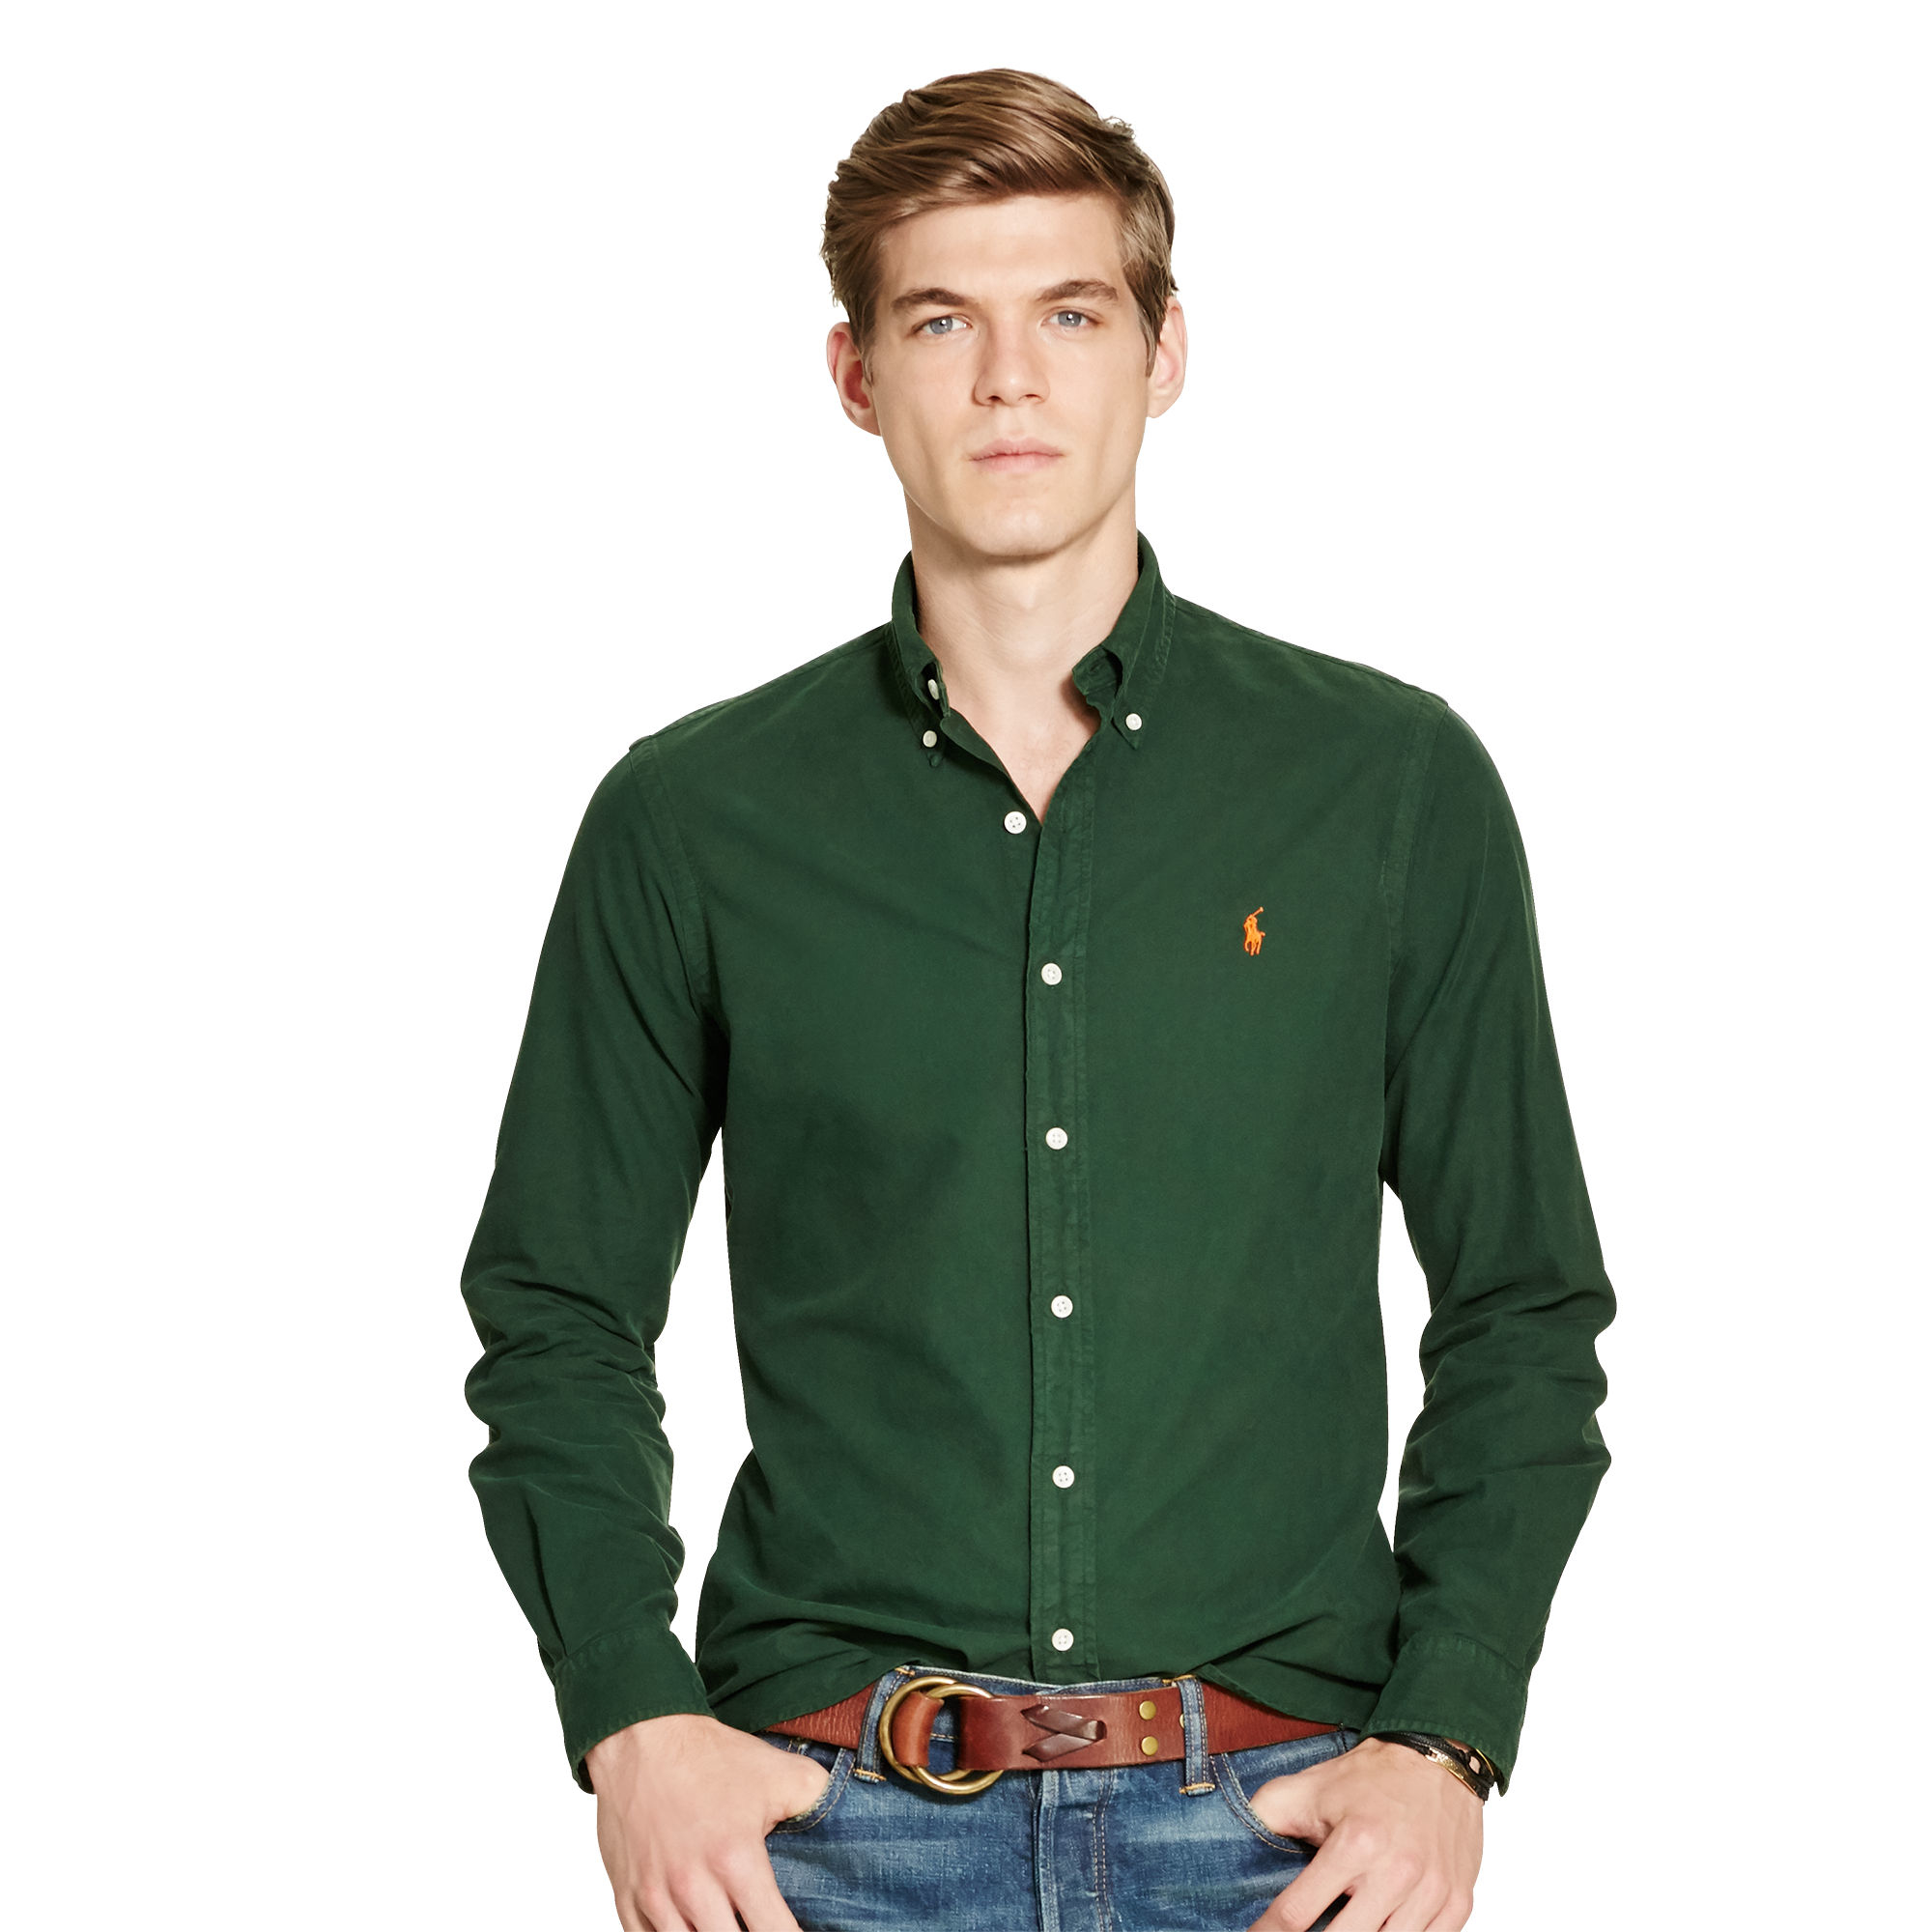 polo ralph lauren garment dyed oxford shirt for men lyst. Black Bedroom Furniture Sets. Home Design Ideas